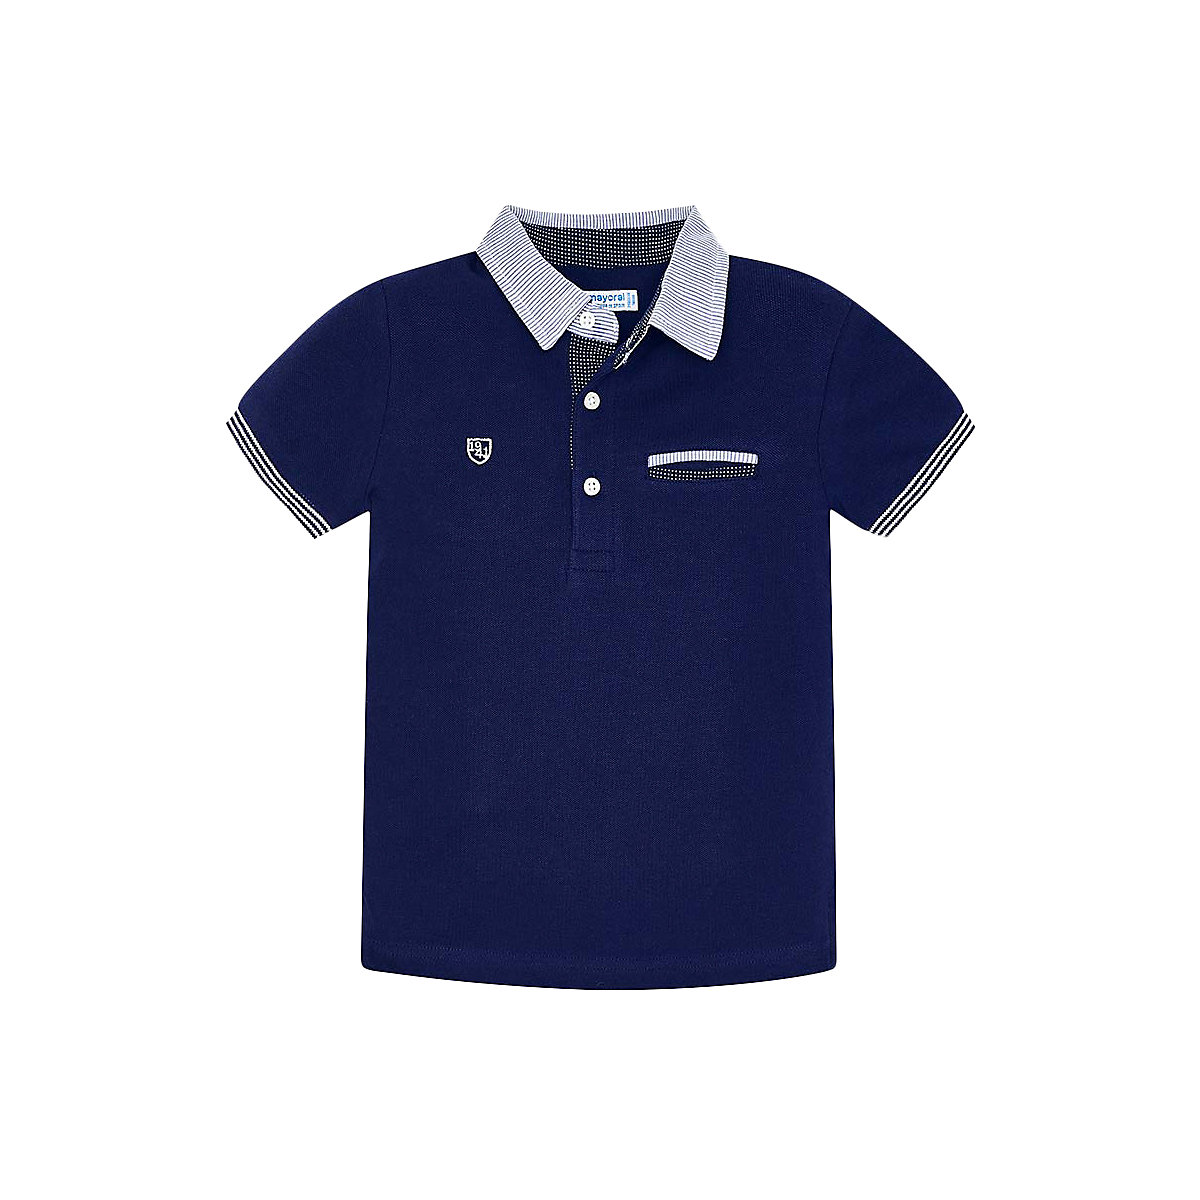 MAYORAL Polo Shirts 10691679 children clothing t-shirt shirt the print for boys tiger 3d print basic t shirt